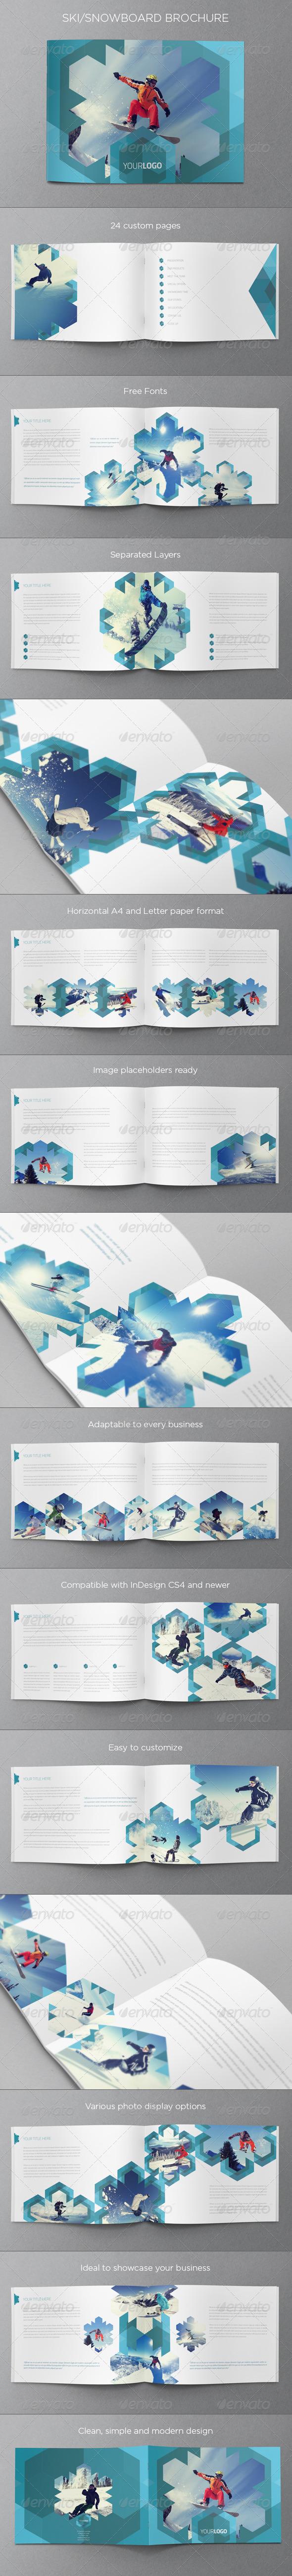 Ski & Snowboard Winter Brochure - Brochures Print Templates